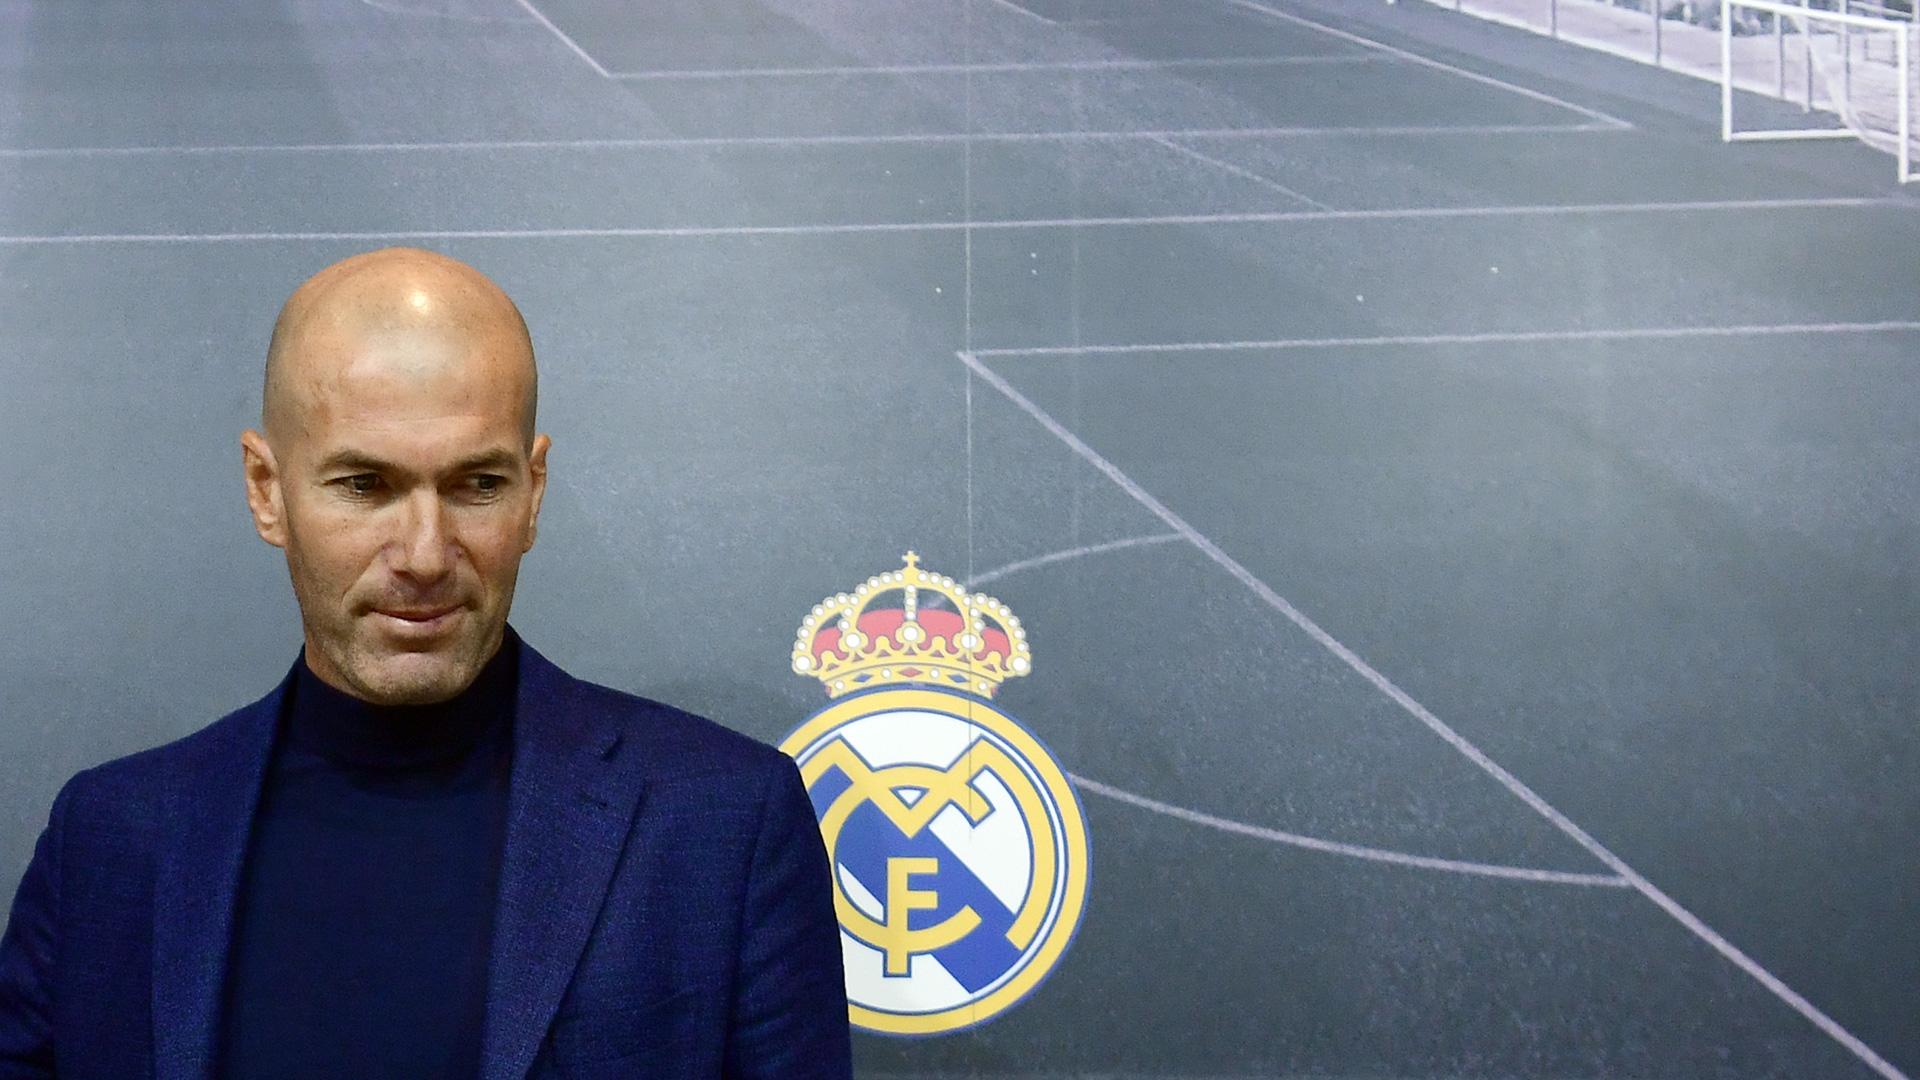 Zinedine Zidane interesado en dirigir a Juventus — FUTBOL MUNDIAL